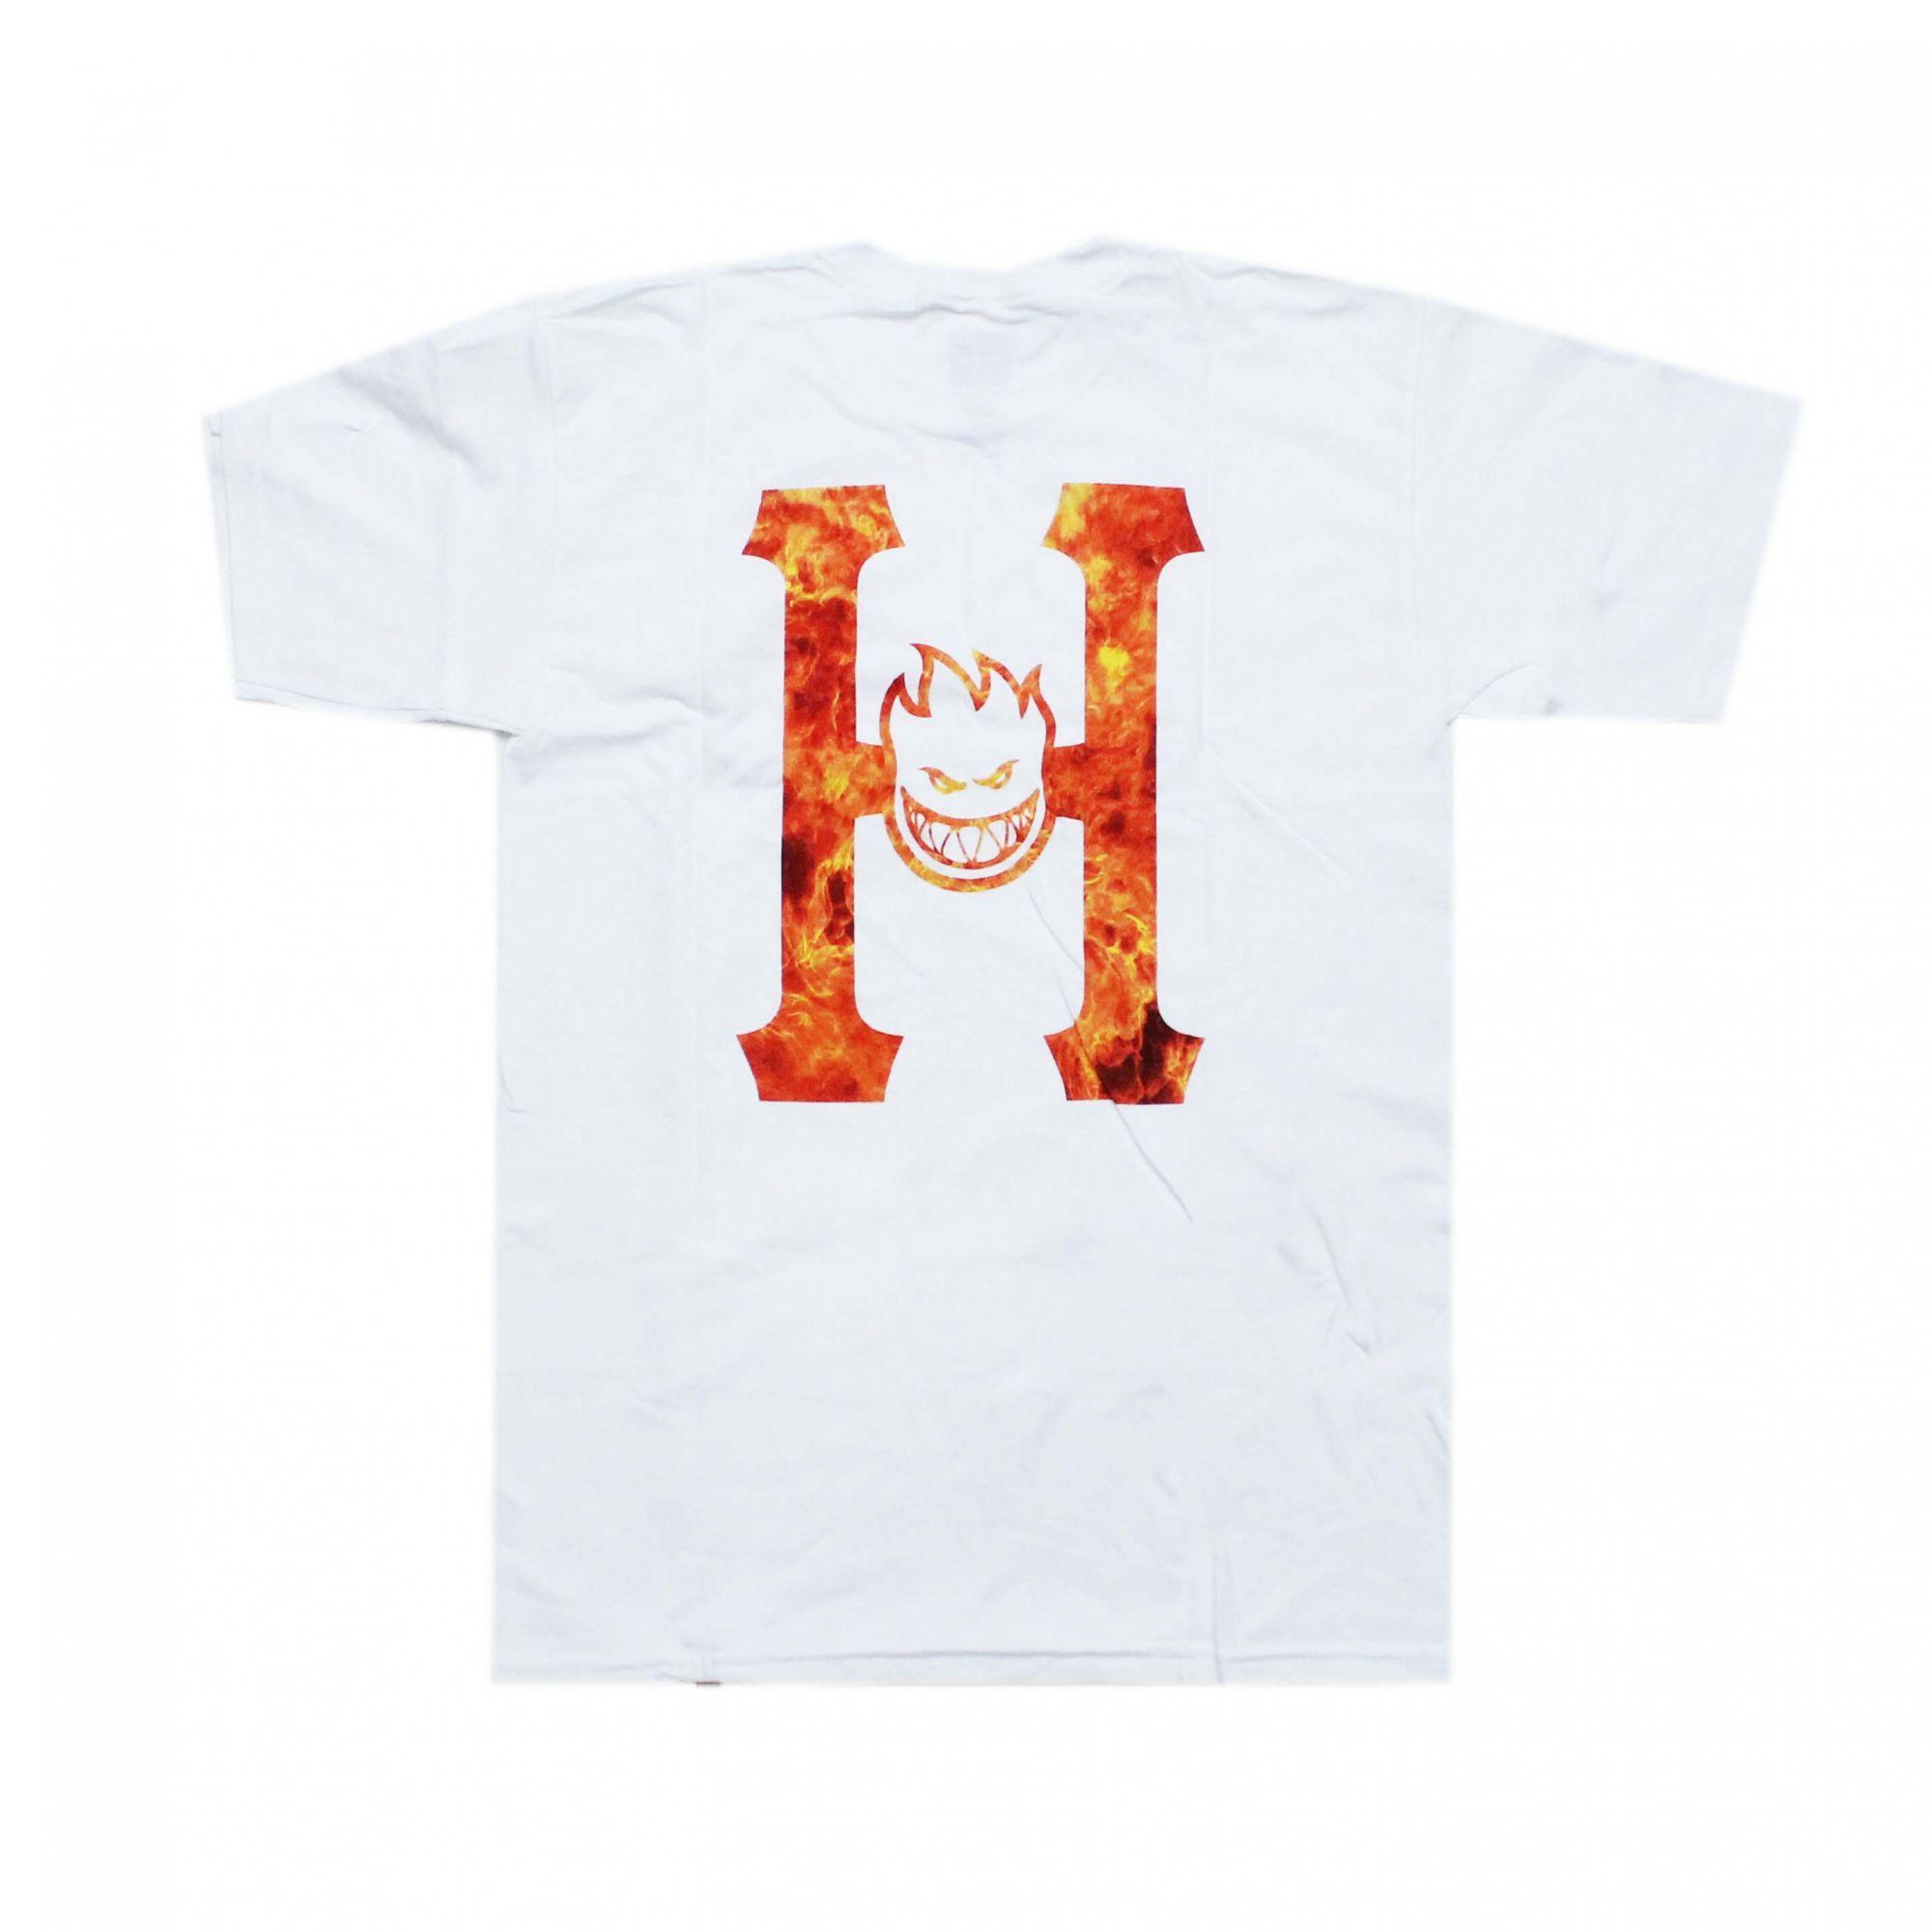 Camiseta HUF x Spitfire Flaming Branco (Importado)